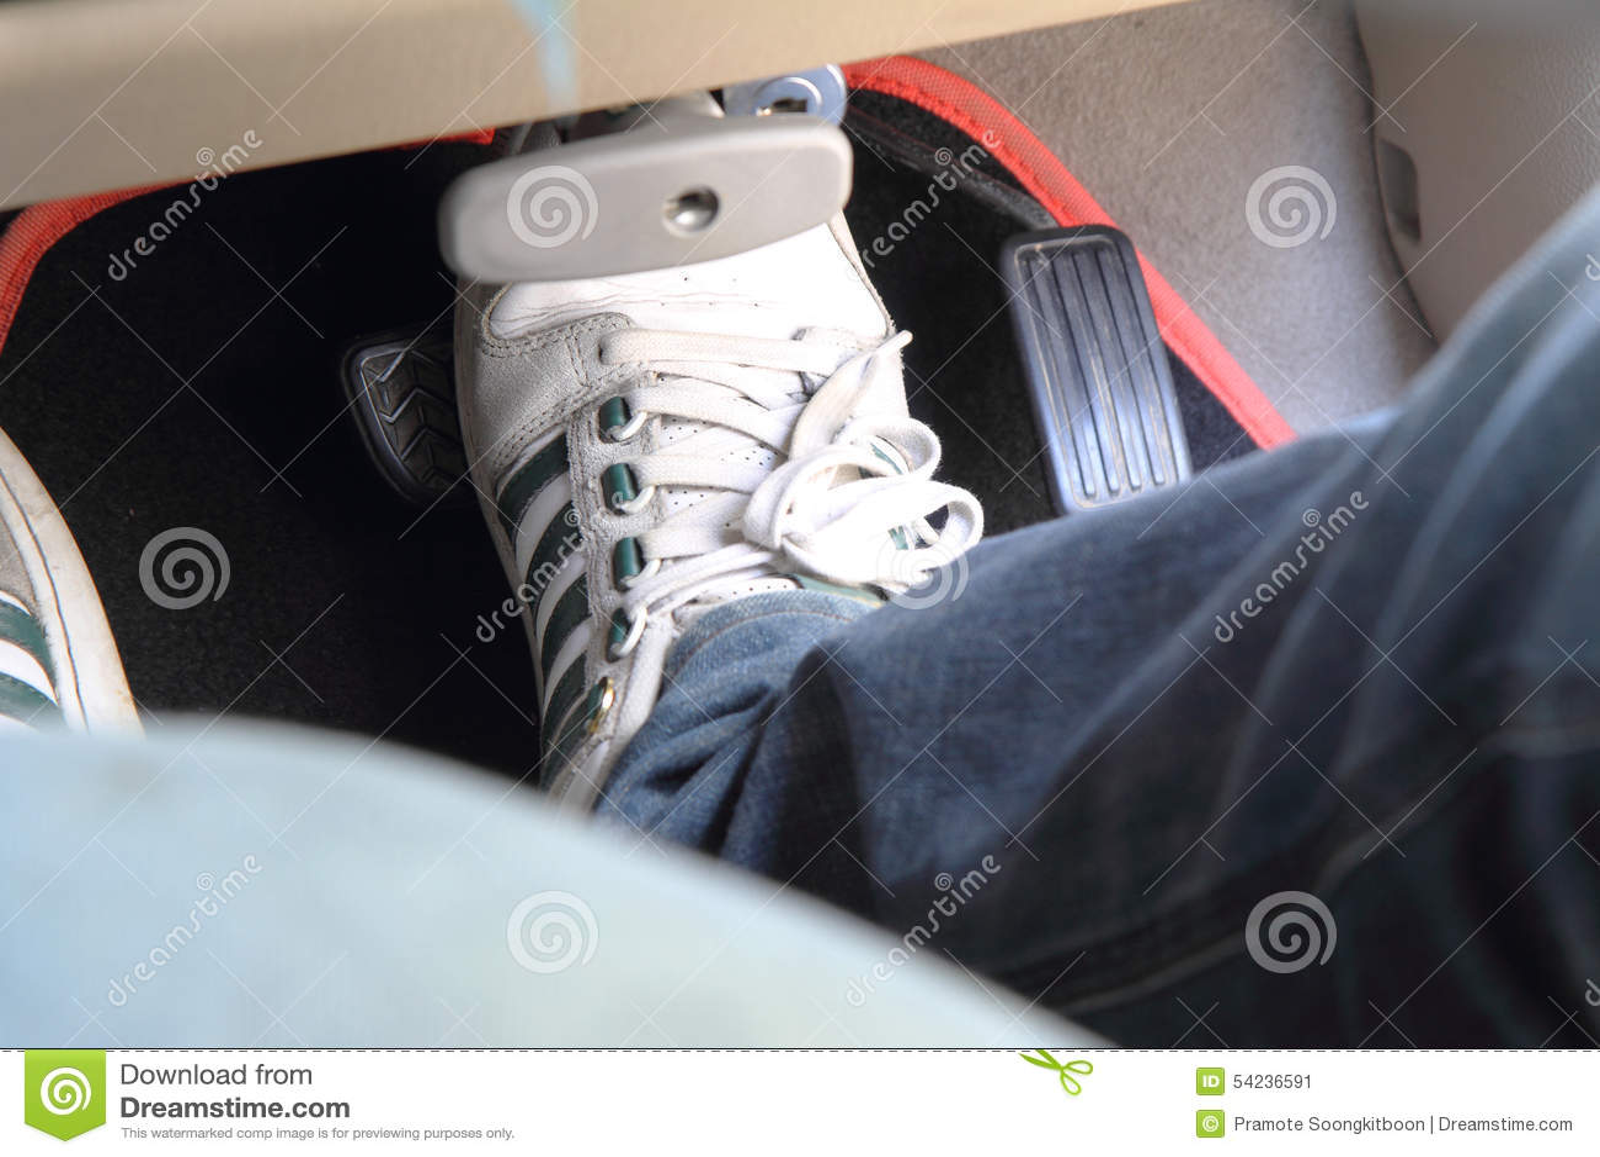 break pedal in the car stock image image of transport 54236591. Black Bedroom Furniture Sets. Home Design Ideas